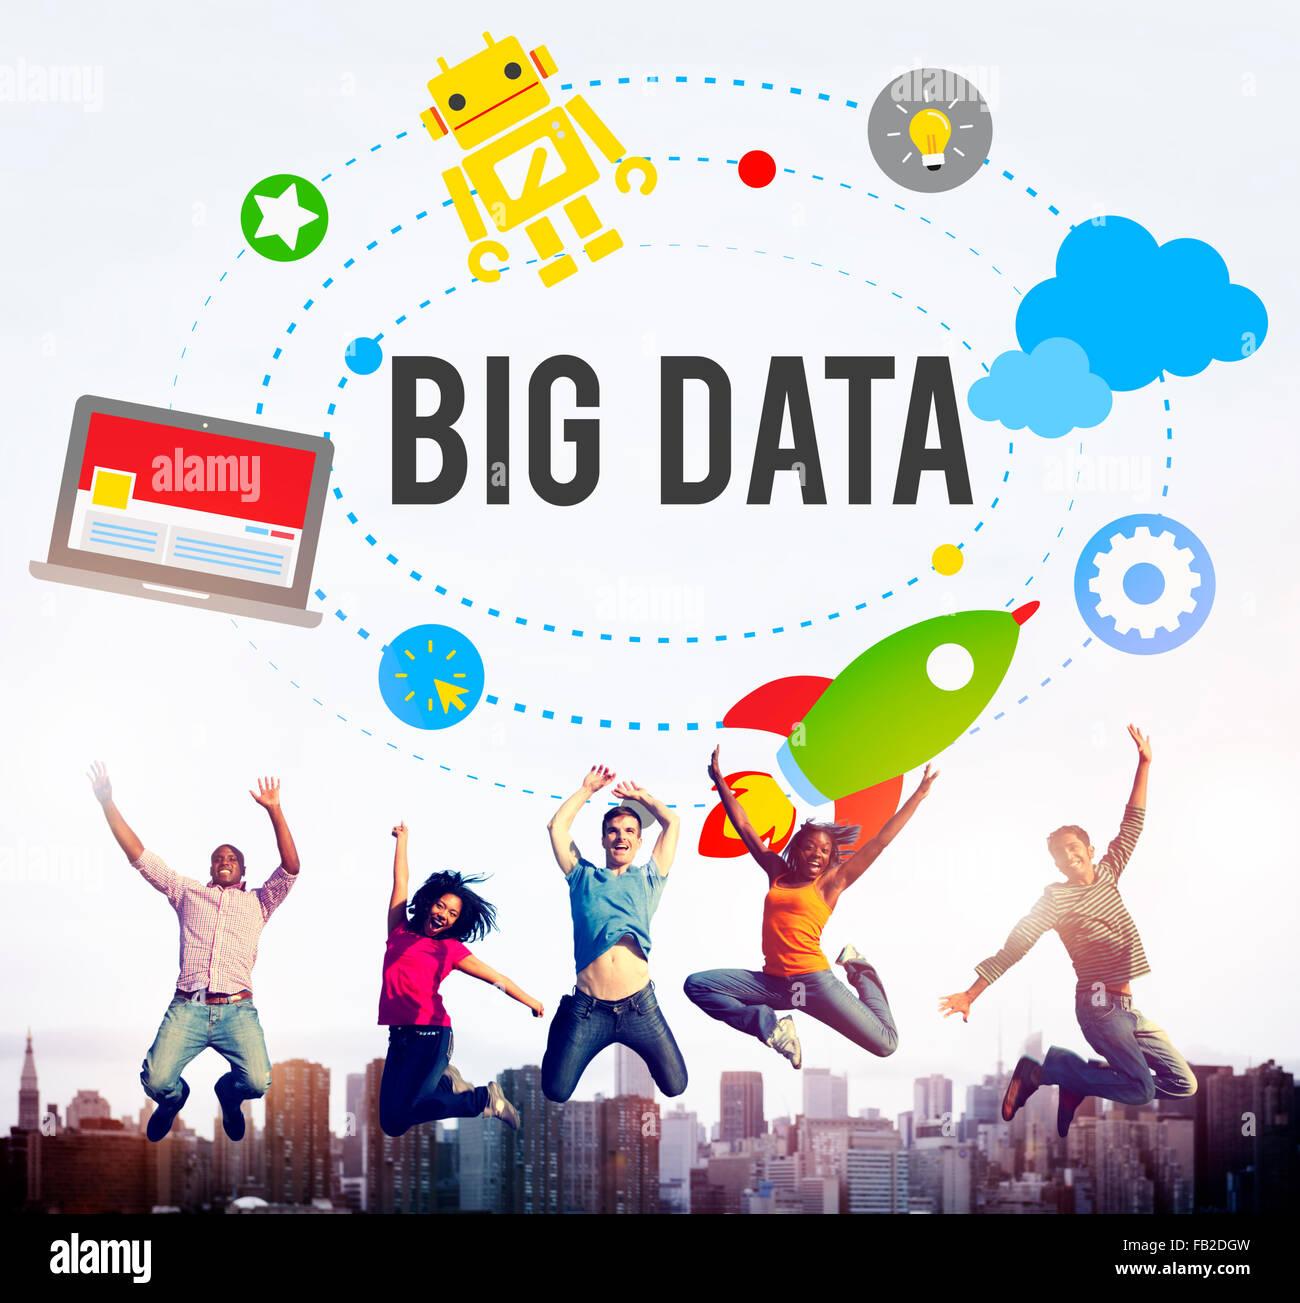 Big Data Database Storage Analysis Security Concept - Stock Image